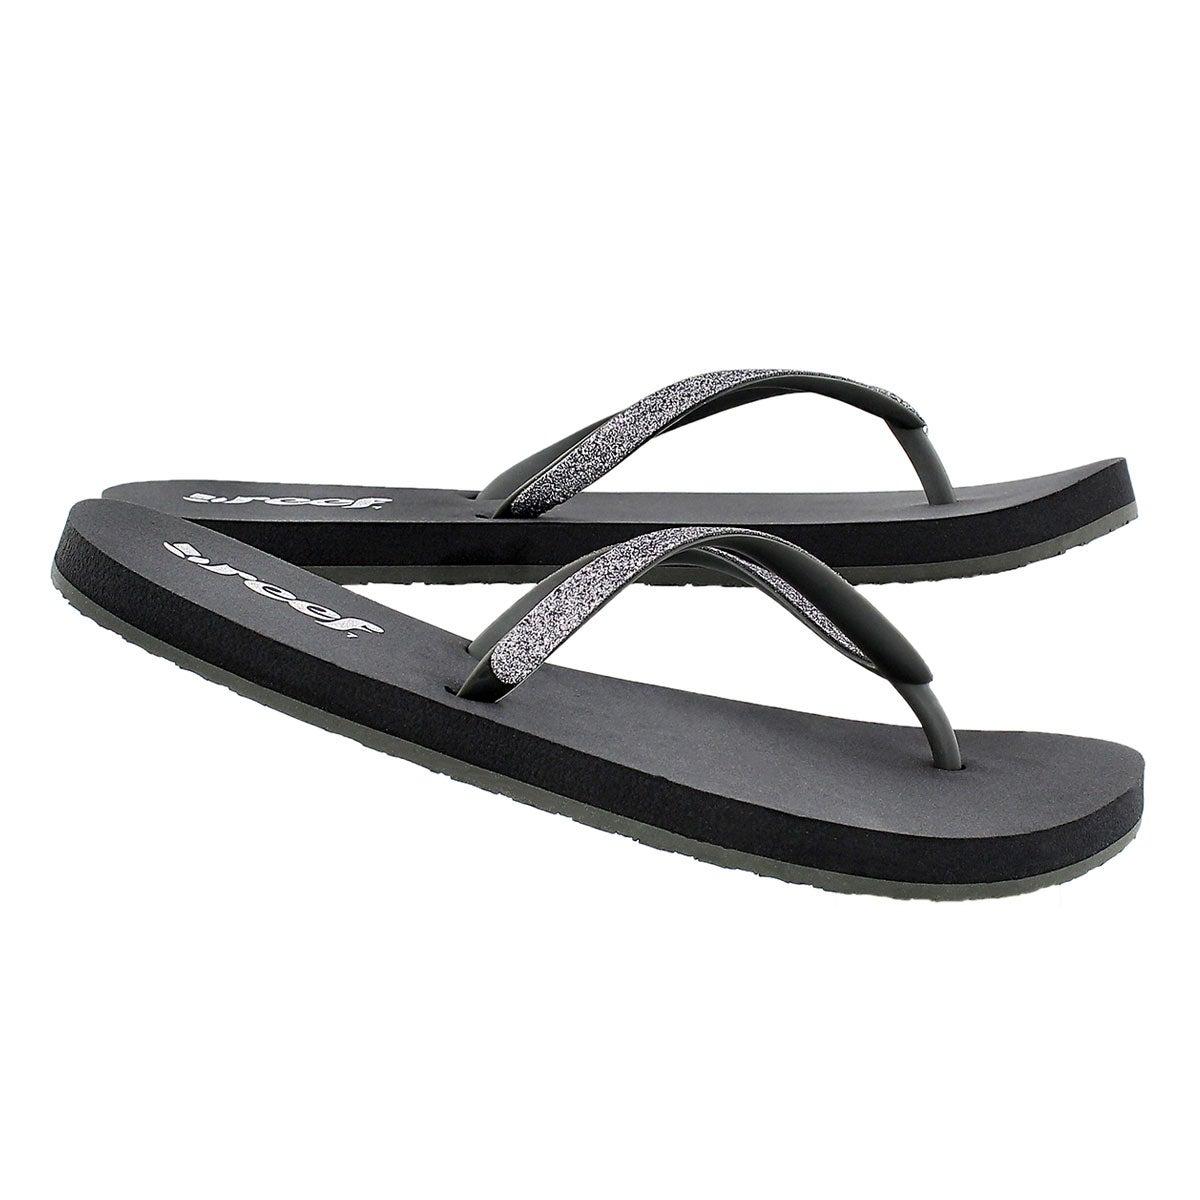 Sandale tong Stargazer, gris foncé, fem